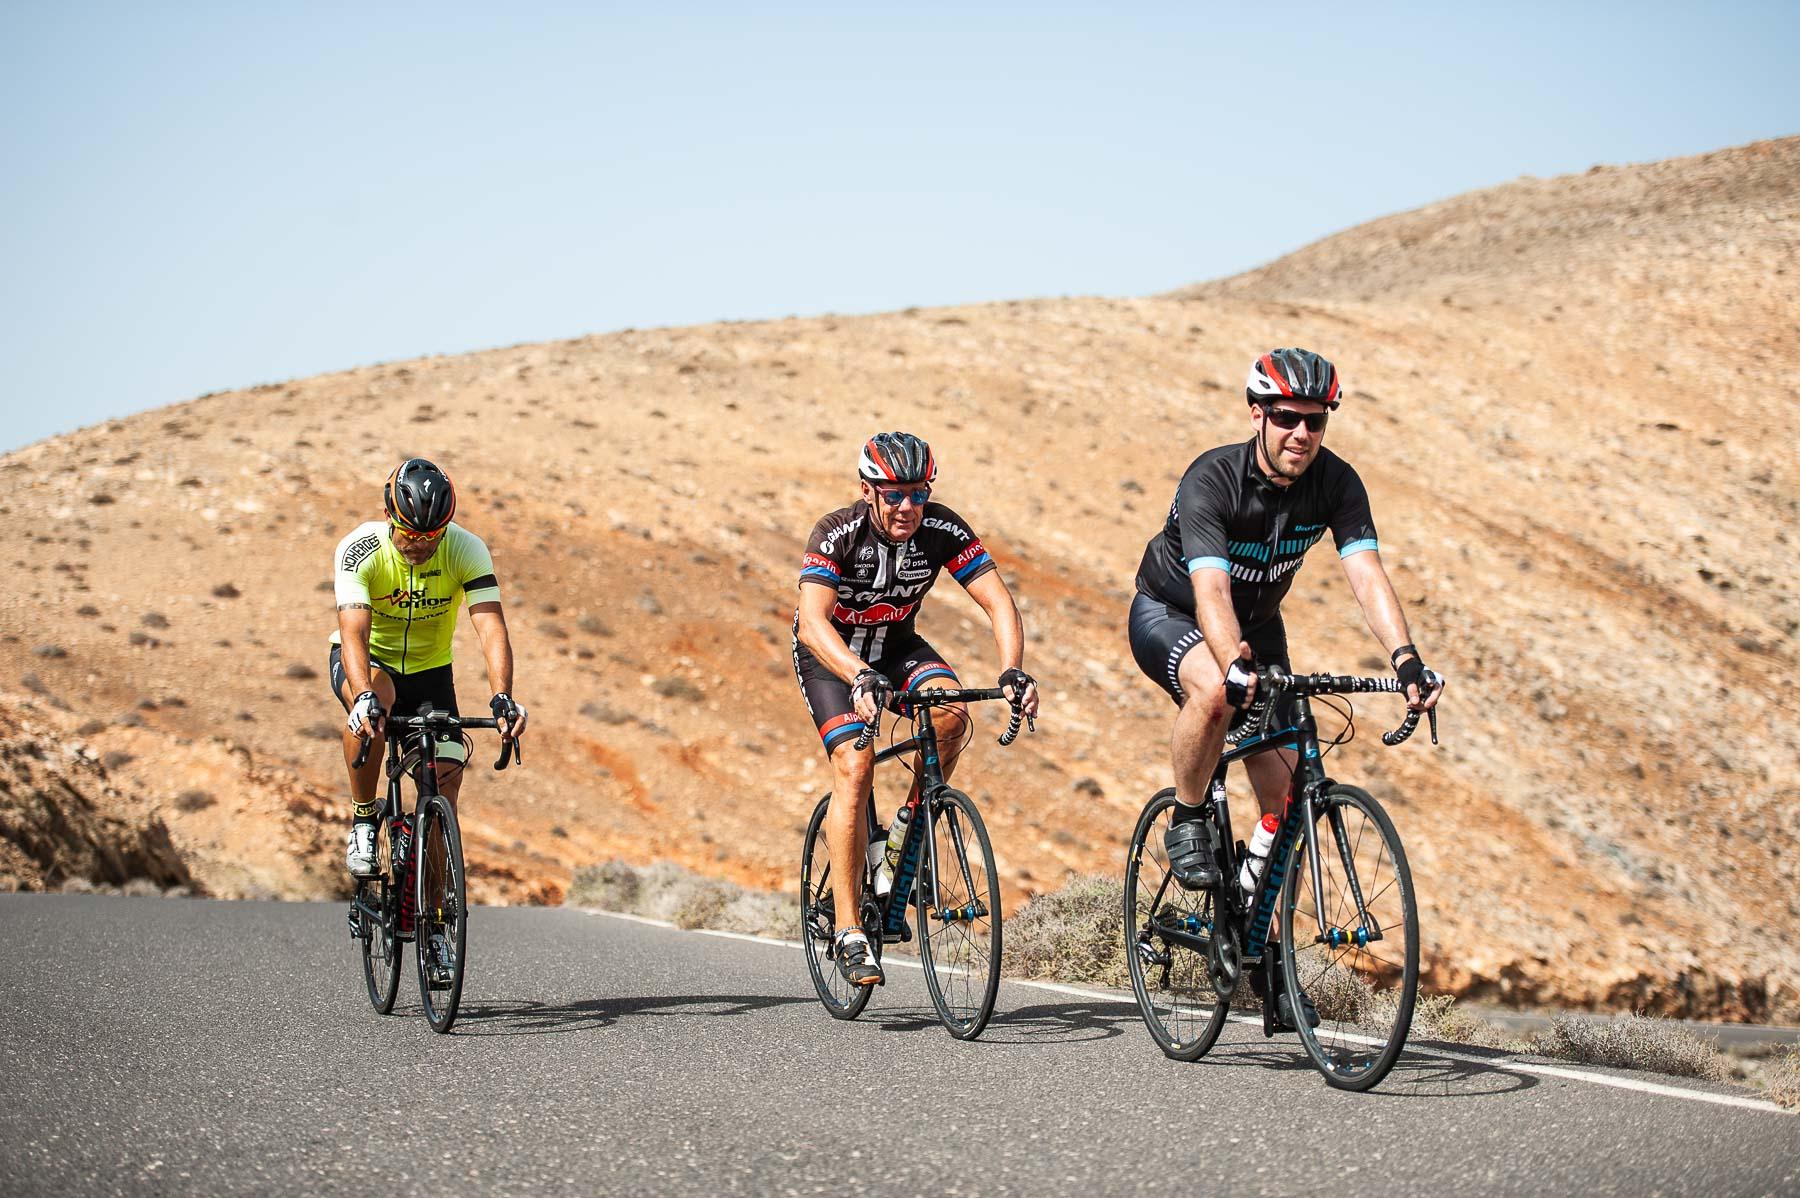 rennrad mountainbike touren fastmotion bike fuerteventura. Black Bedroom Furniture Sets. Home Design Ideas